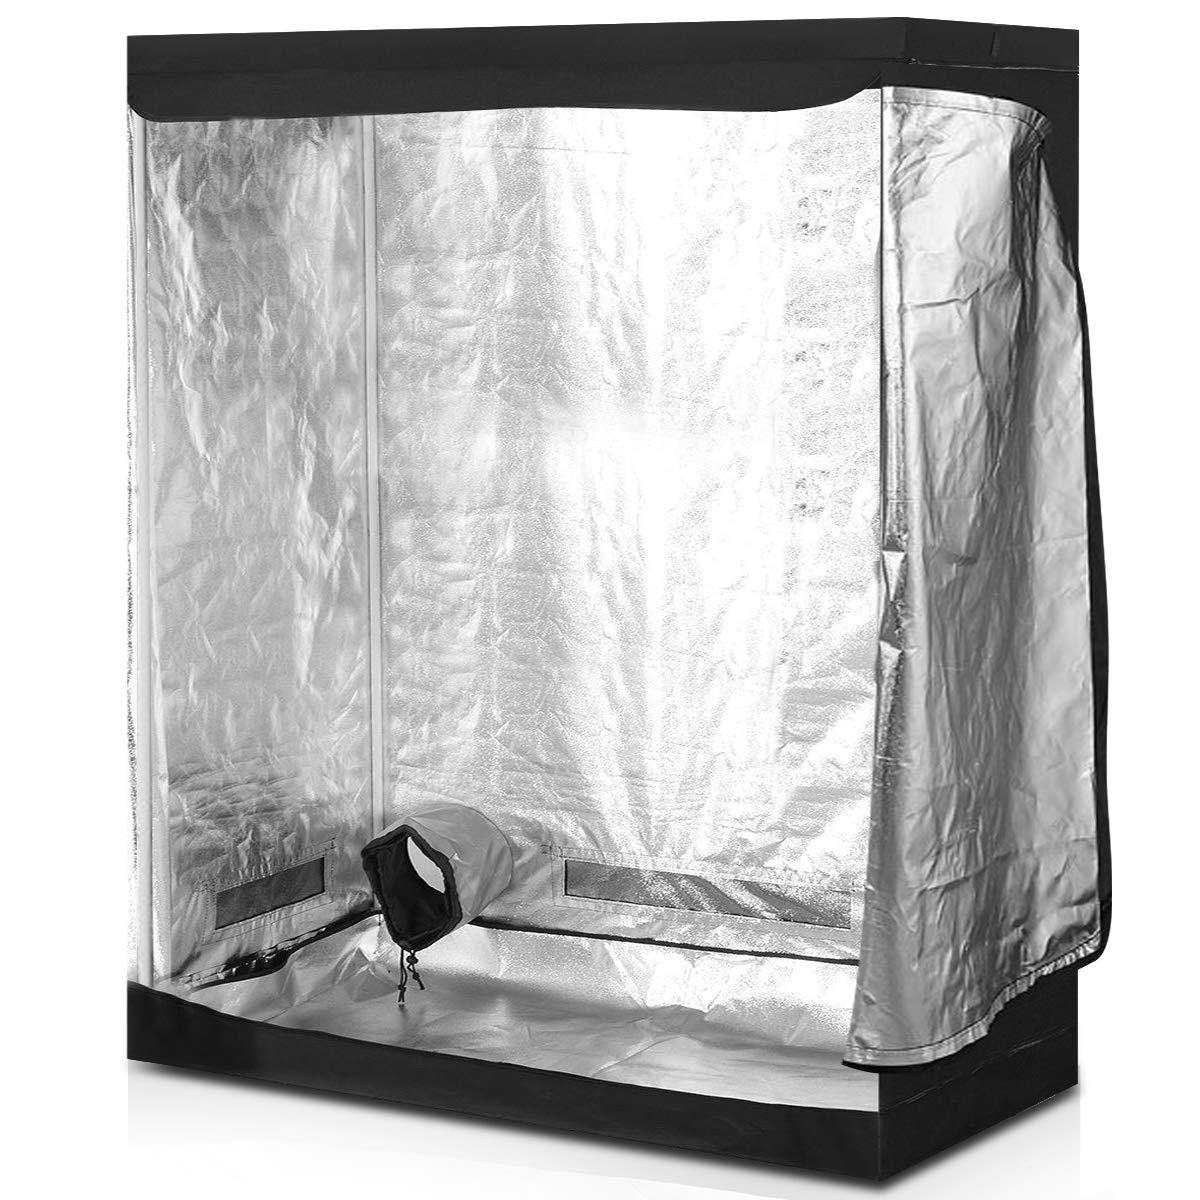 Giantex Plant Growing Tent Indoor Grow Tent Room Reflective Hydroponic Non Toxic Clone Hut 6-Size Indoor Grow Tent 48 X24 X60